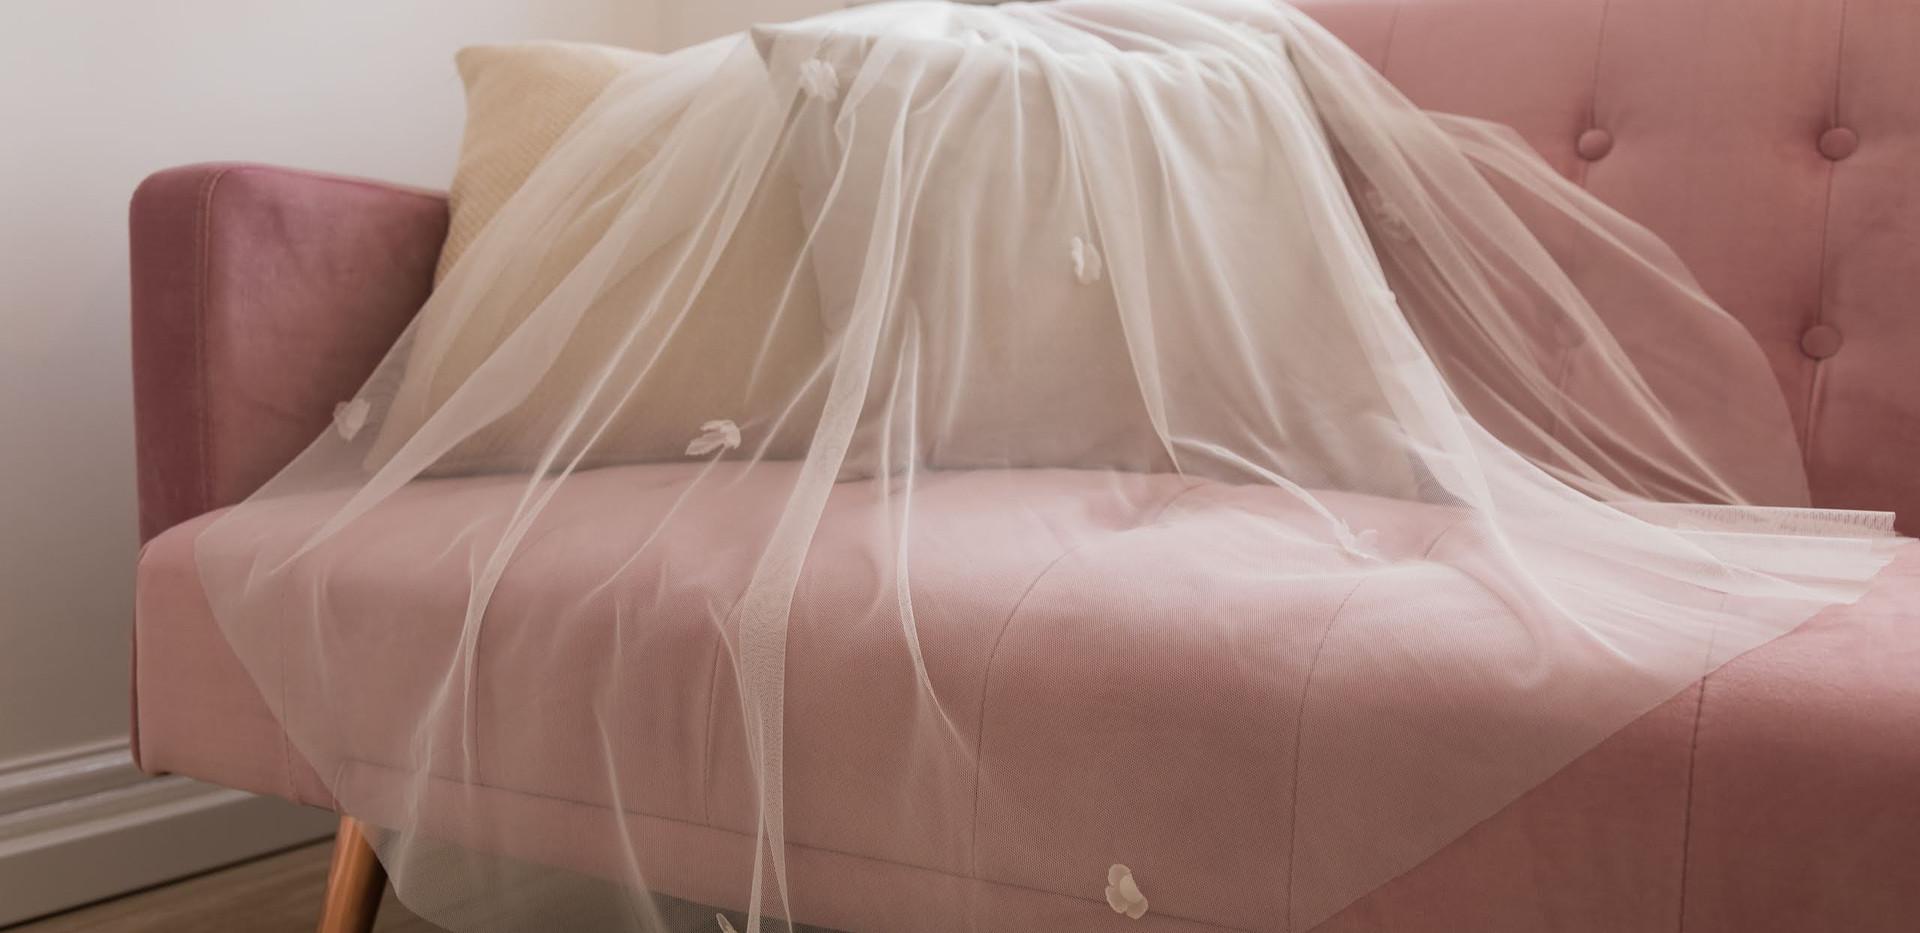 White floral wedding veil